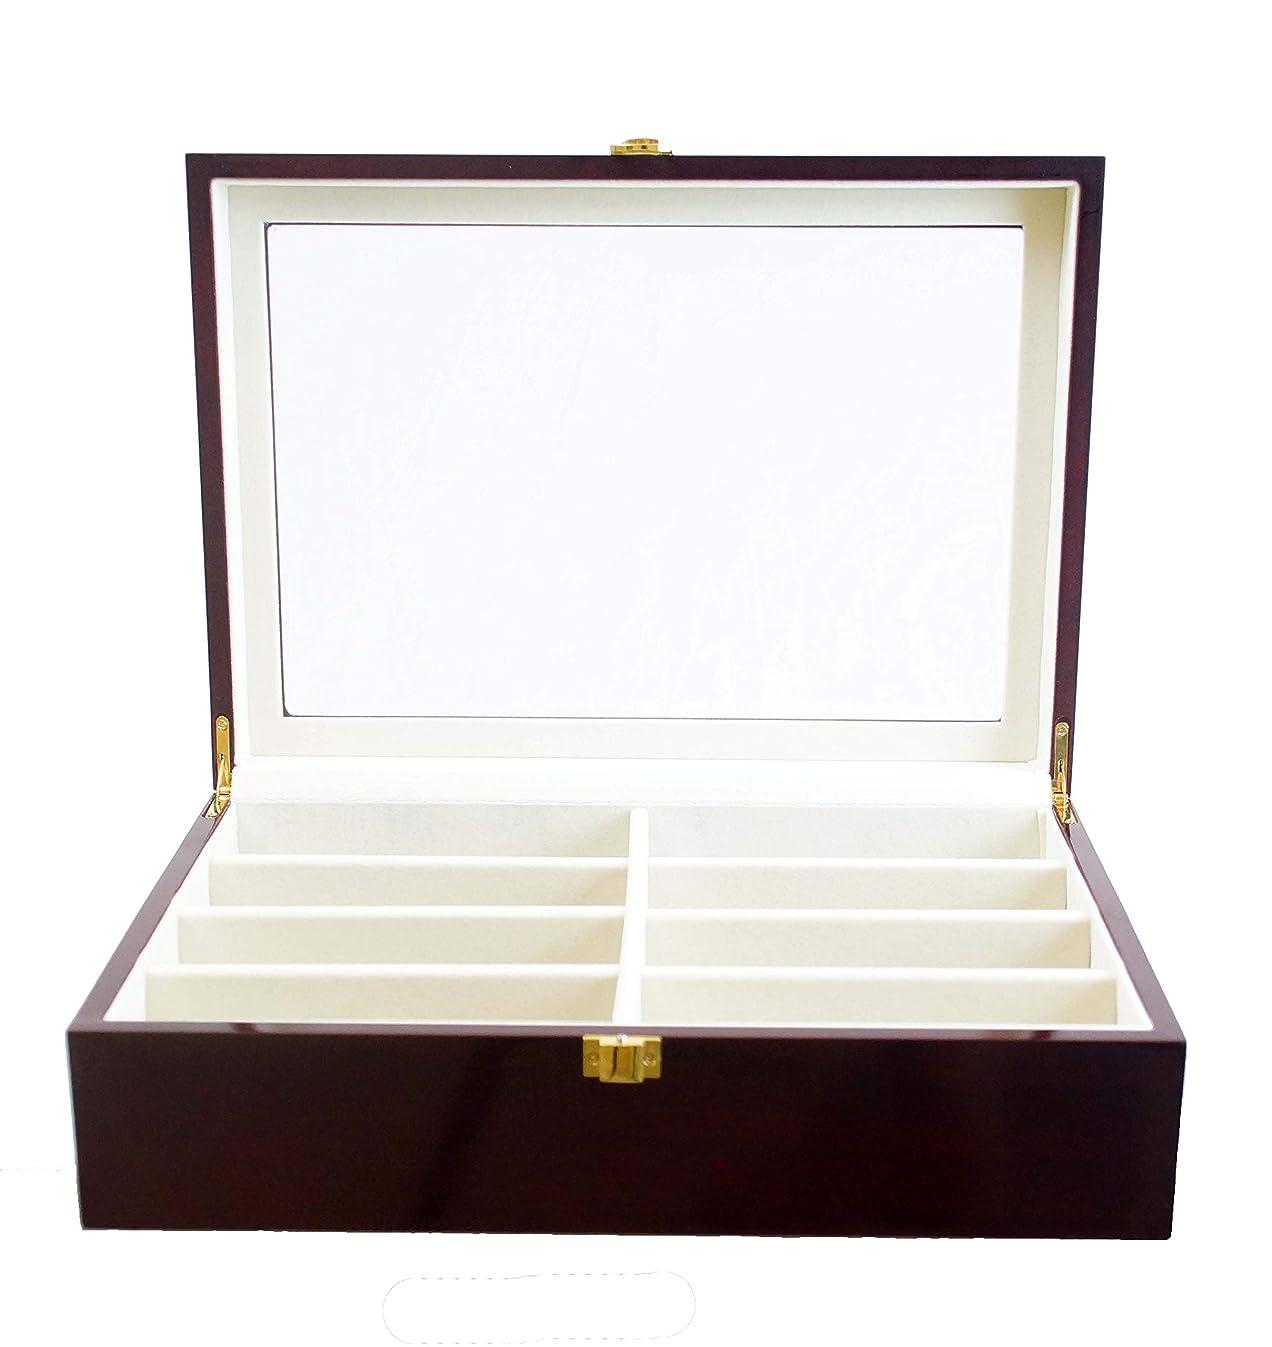 Roomganize Luxury Eight-Compartment Sunglasses Organizer and Jewelry Case (Cherry)